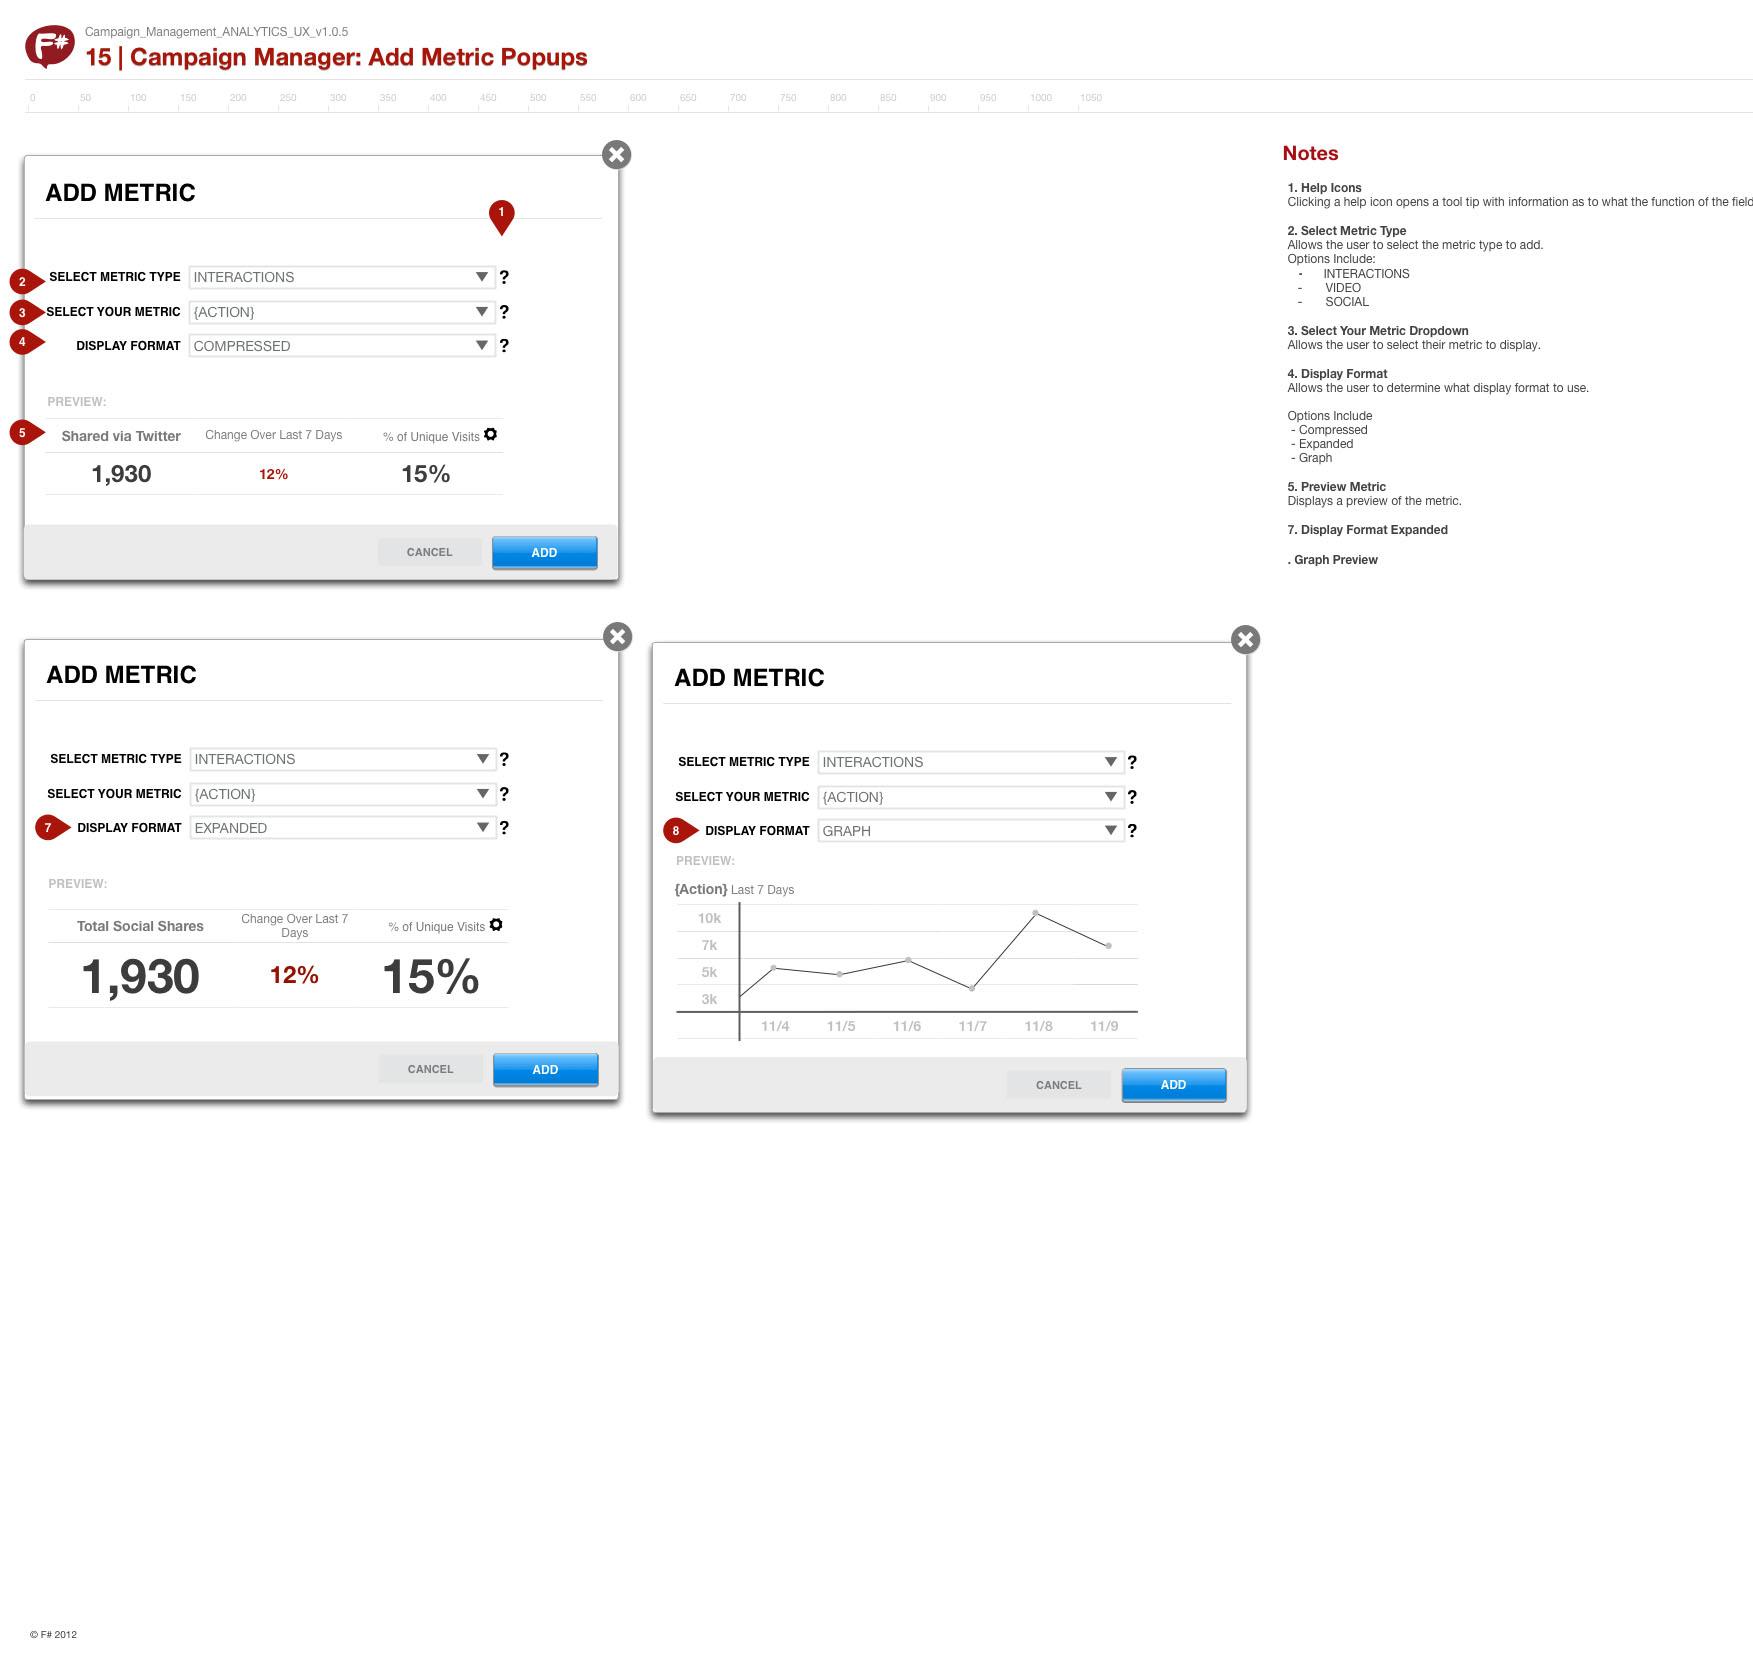 5Campaign_Management_ANALYTICS_UX_v1.0.5 copy.jpg